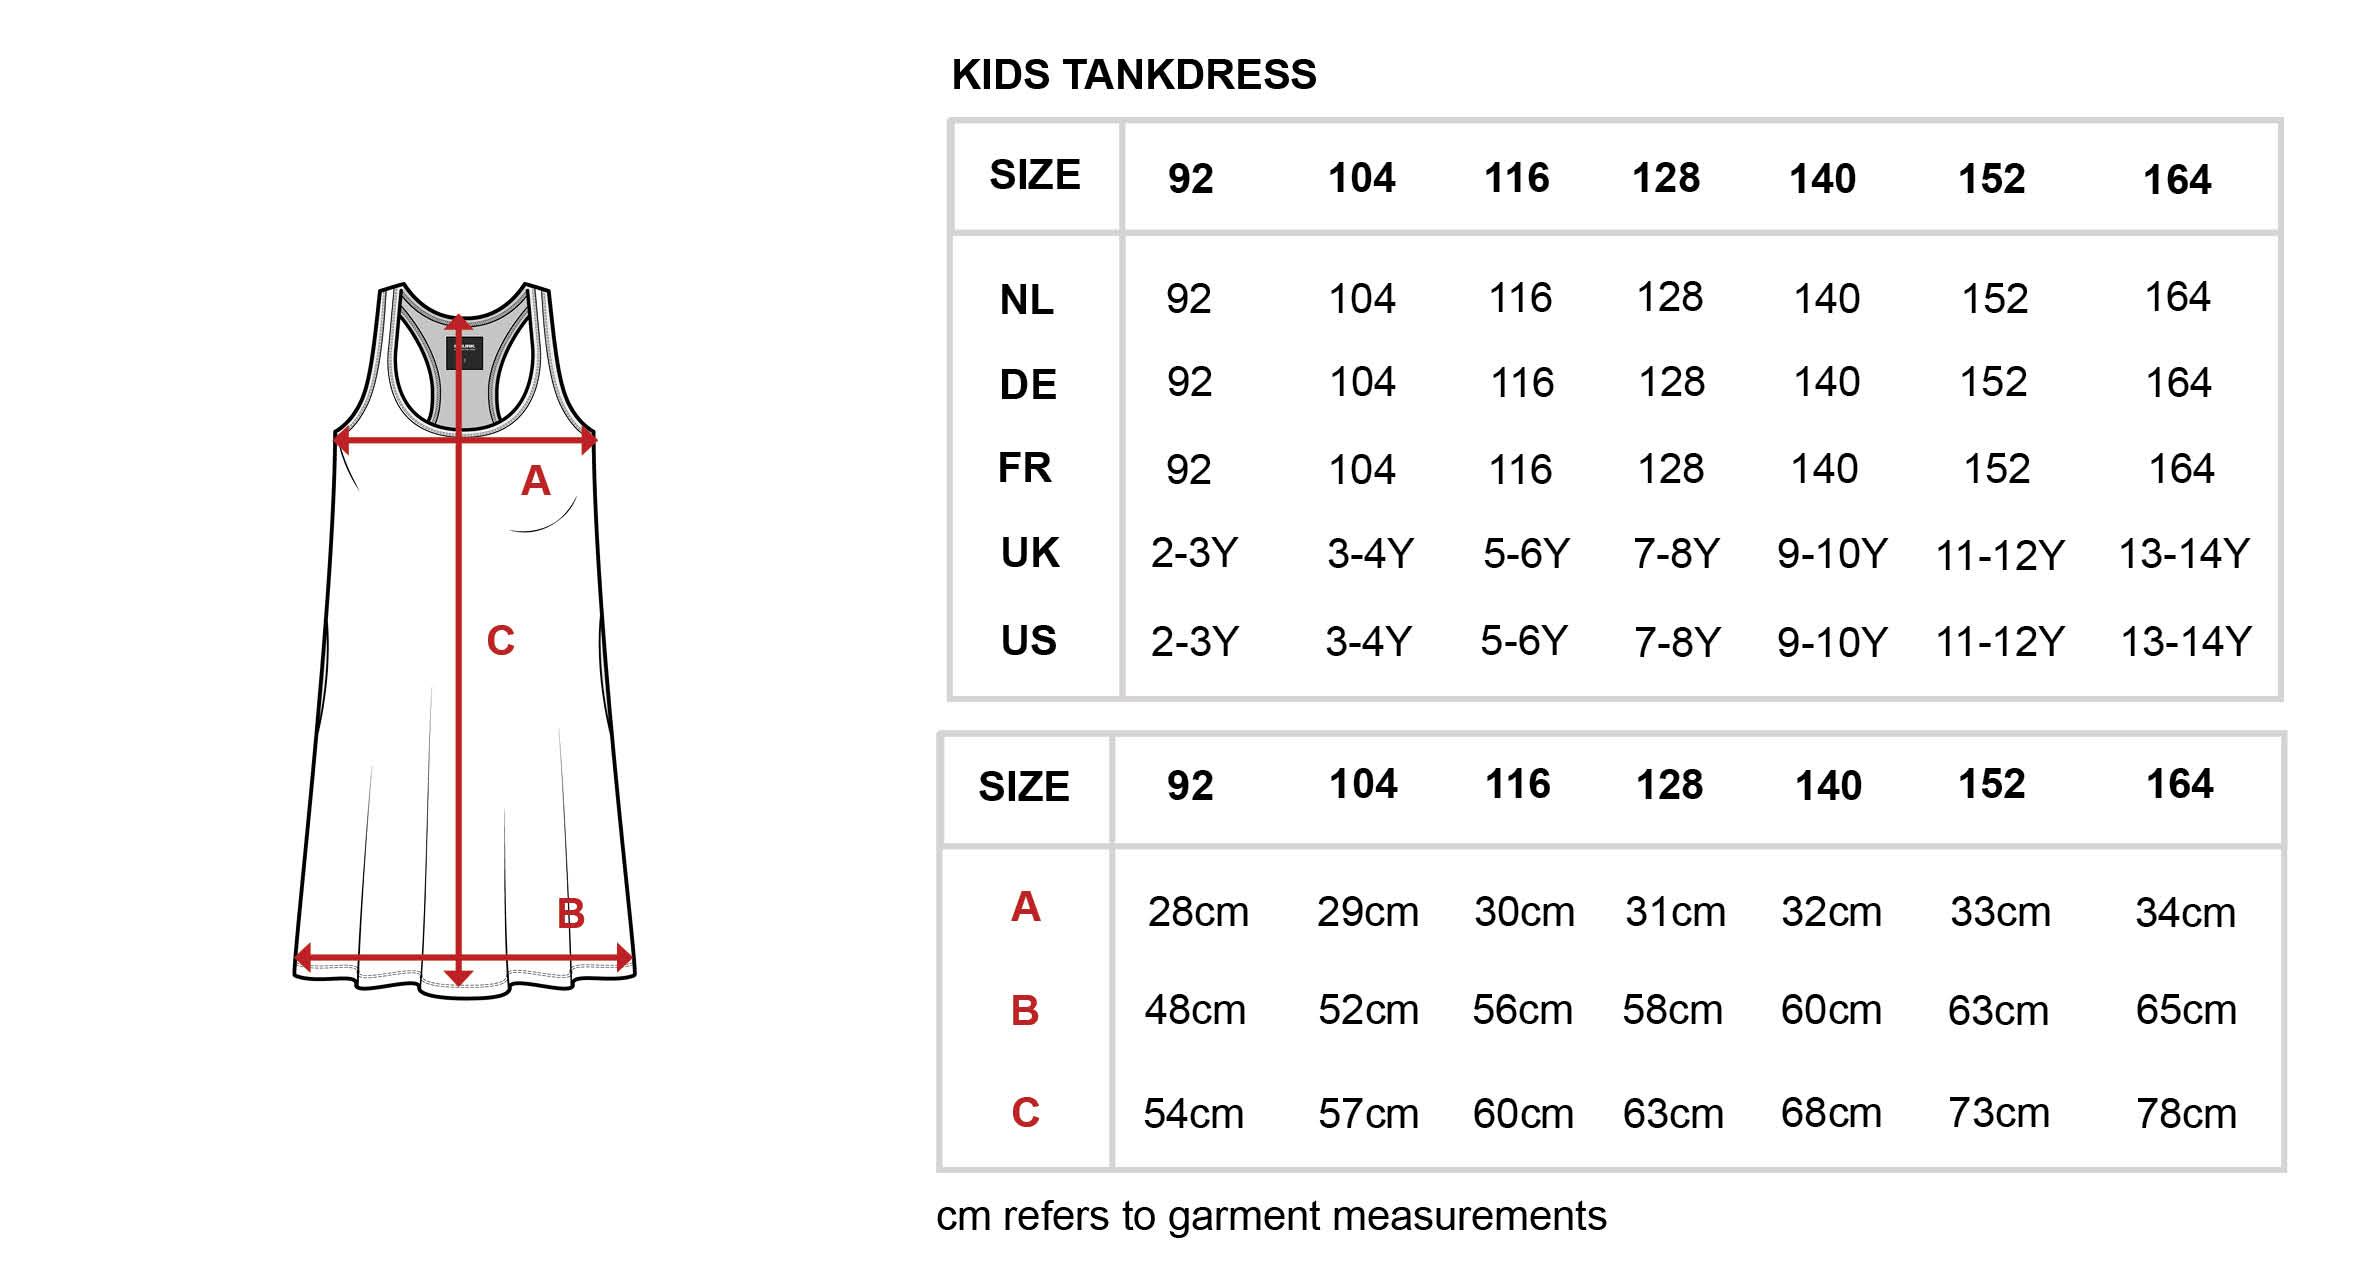 SS20-Kids-Tankdress